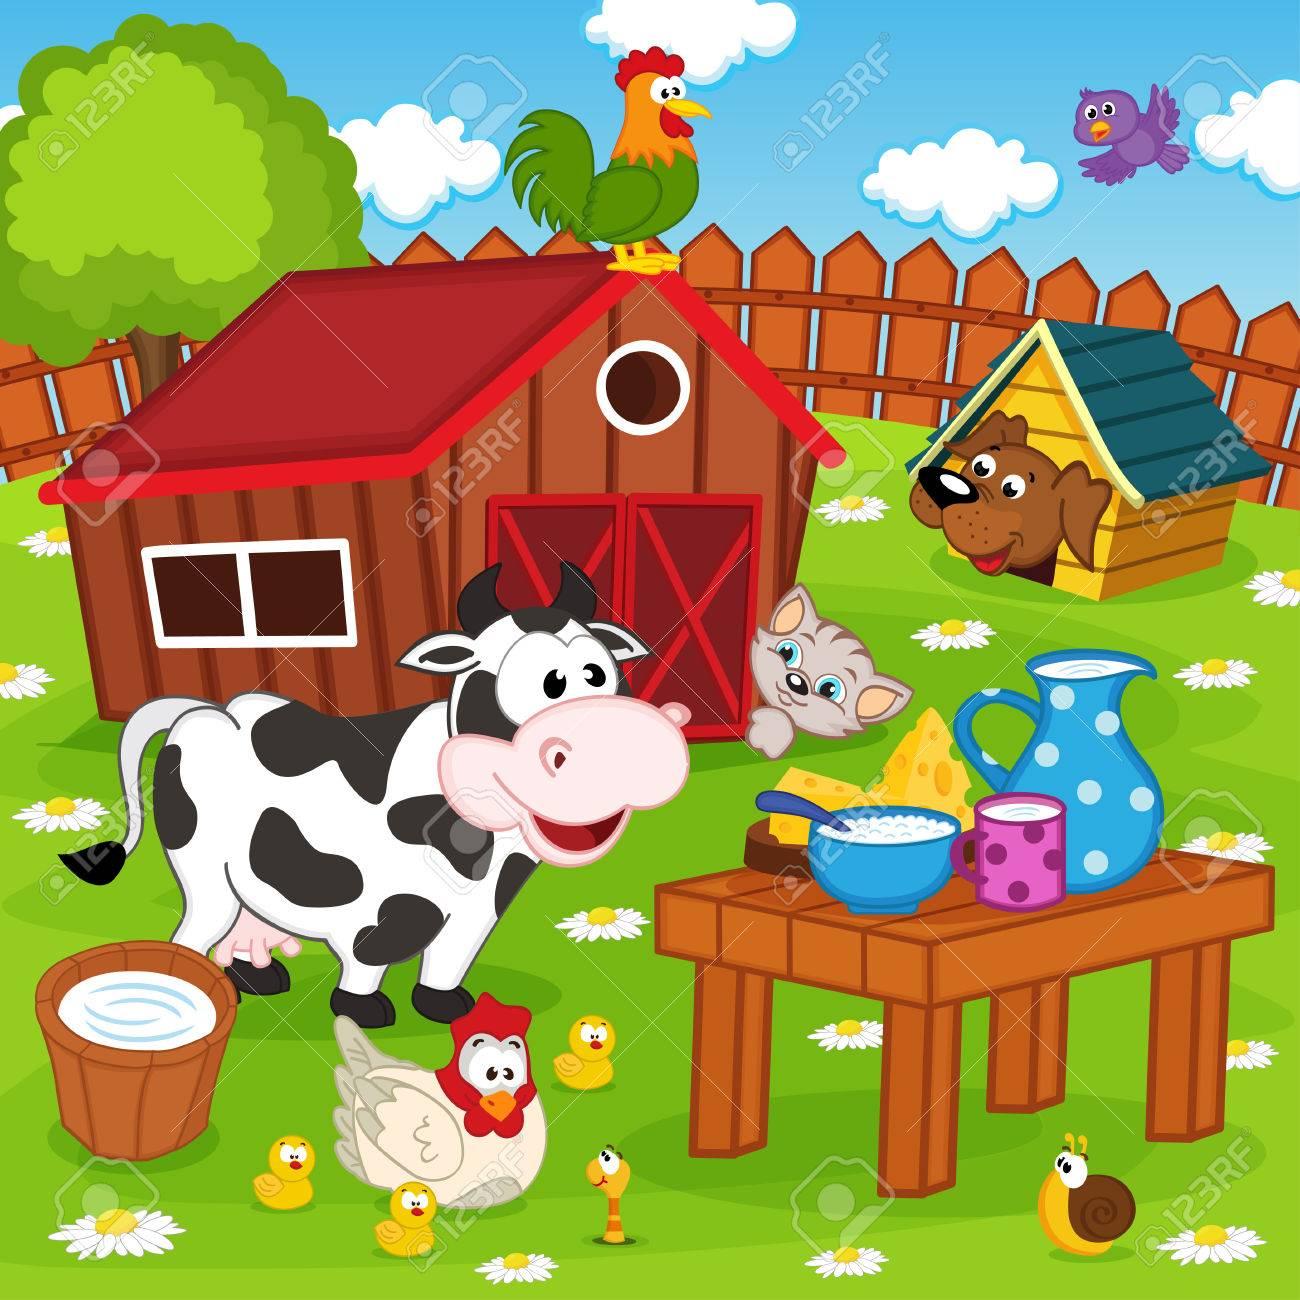 farm animals in barnyard - vector illustration, eps Standard-Bild - 36750816